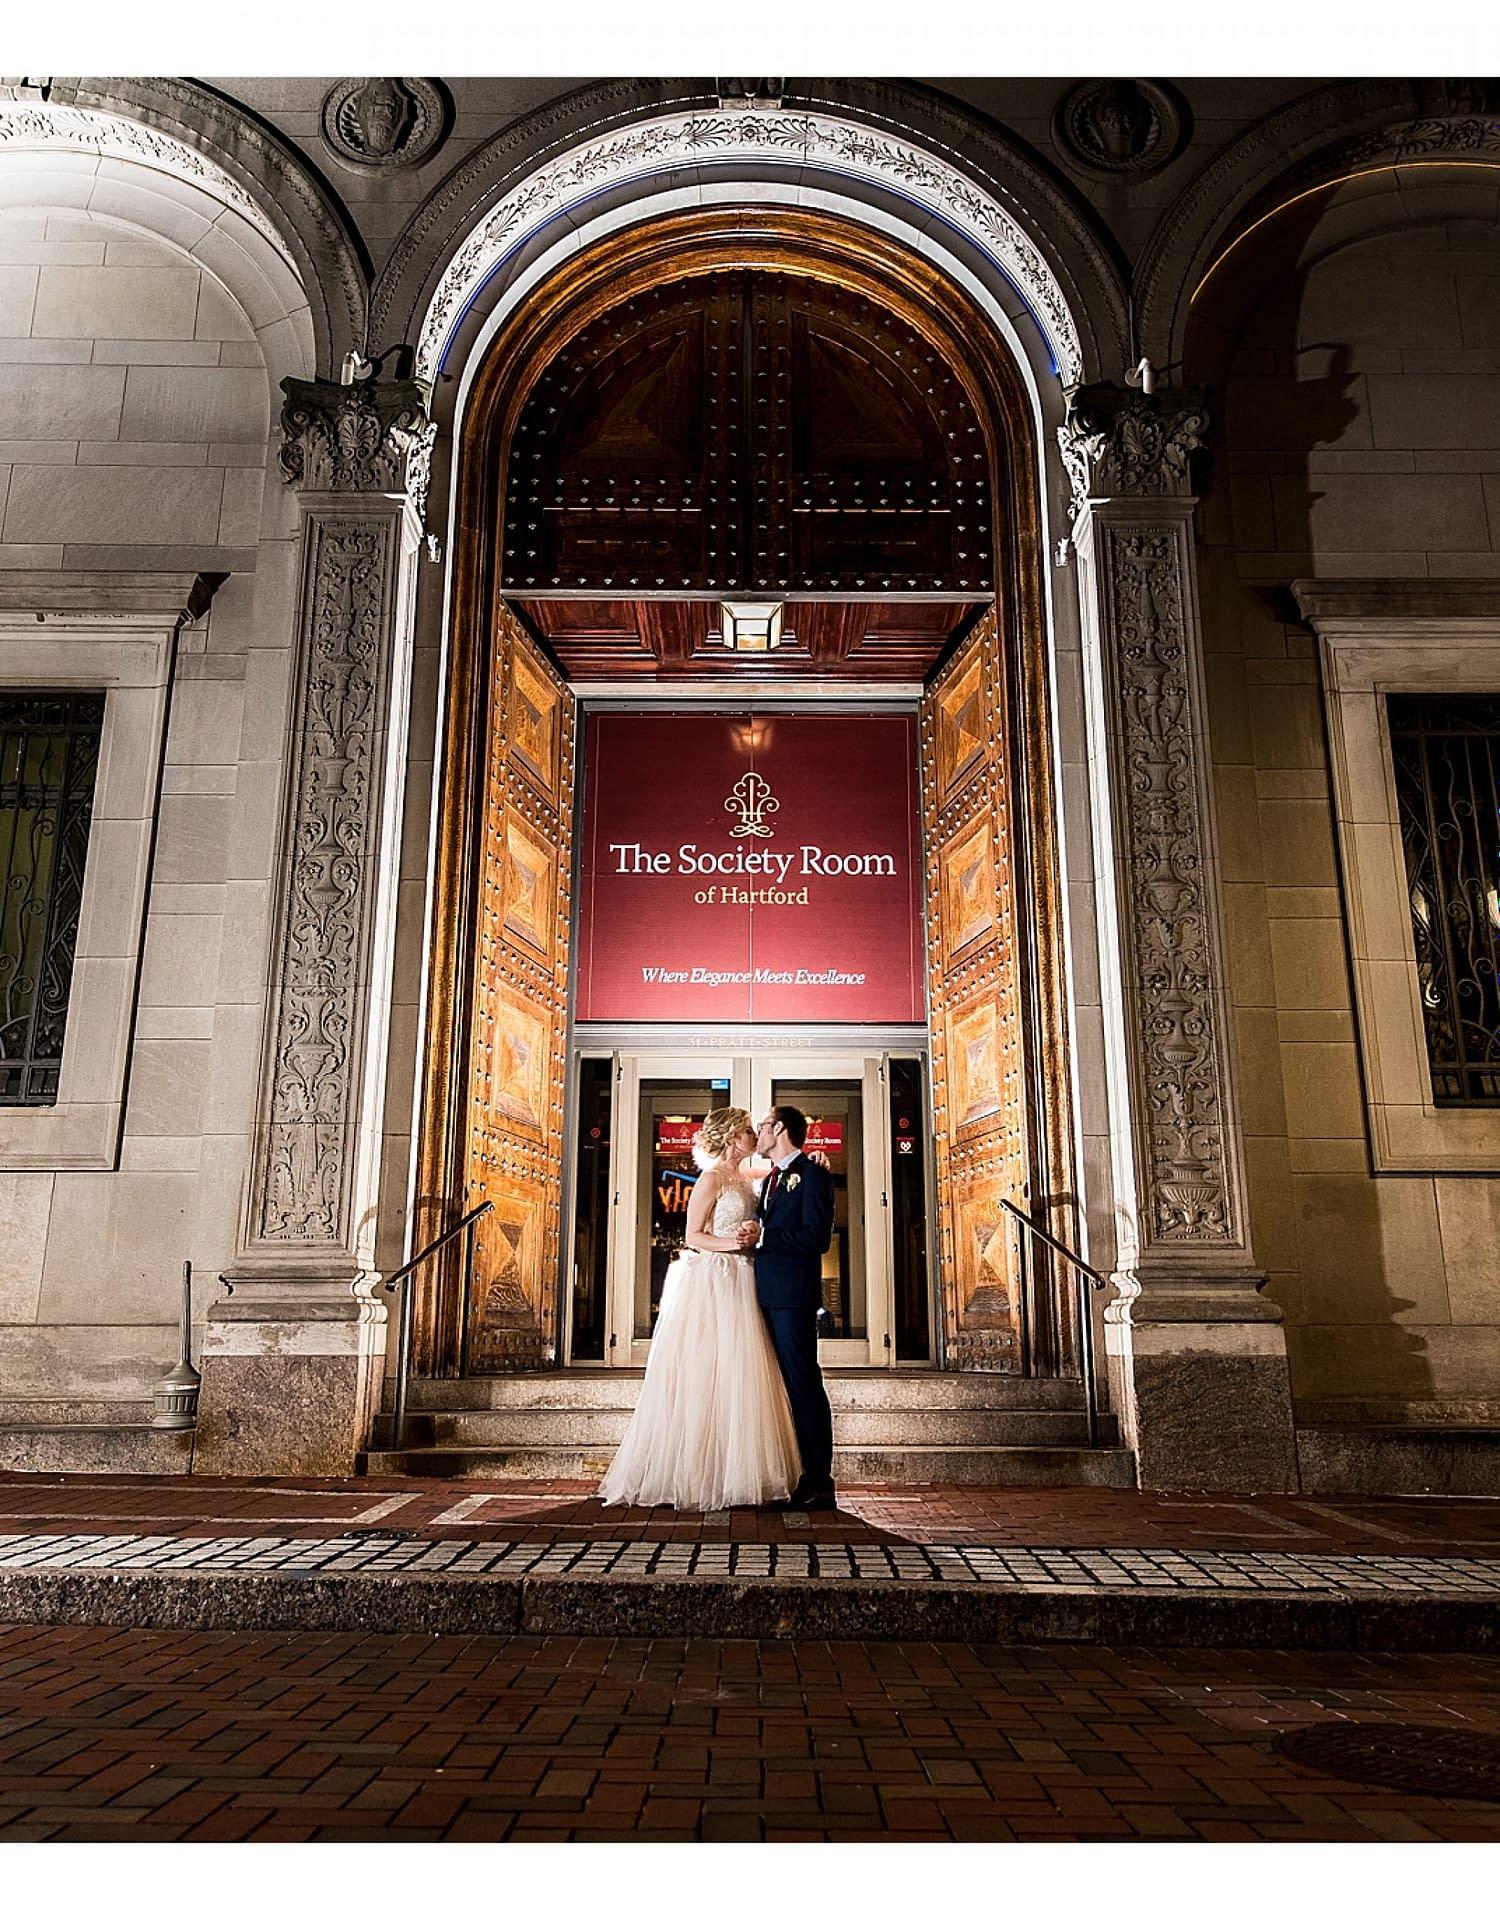 1149-J.BensonPhotography_Wedding_JeffTheresa_Society_Room_Hartford_CT